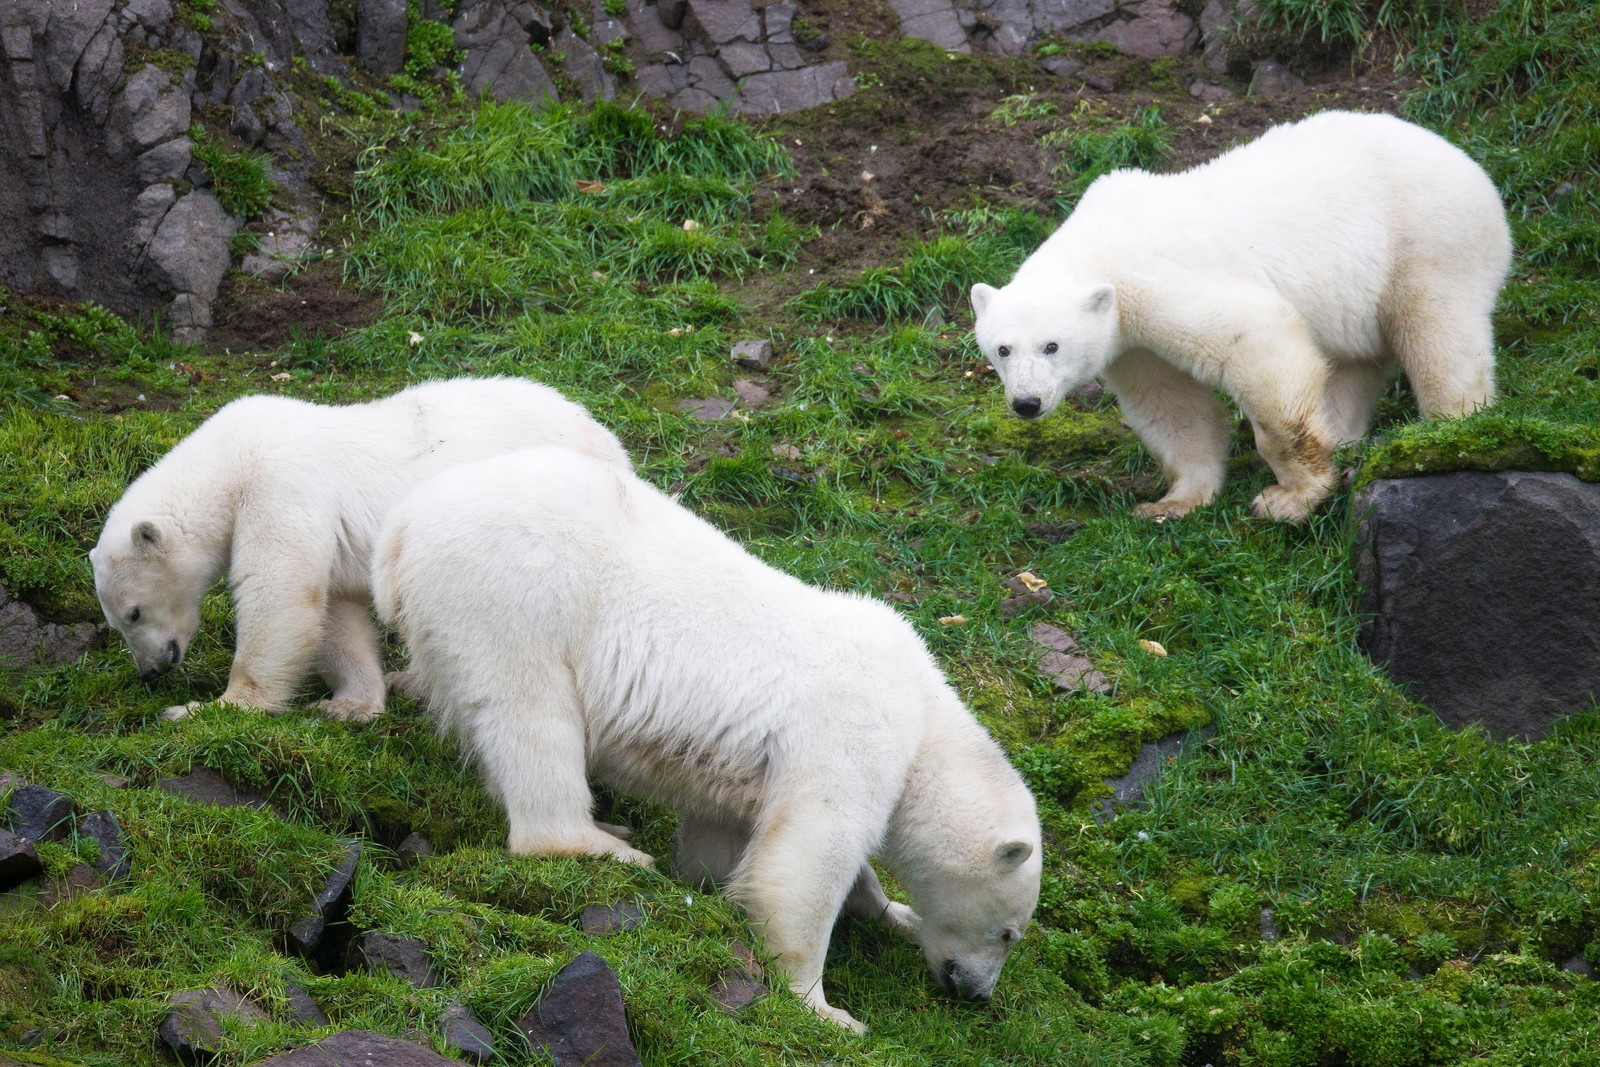 En isbjørnfamilie slo seg ned i et grøntområde over flere dager på Nordaustlandet av Svalbard. - De gresset i fire timer hver dag, sier Svein Wik.